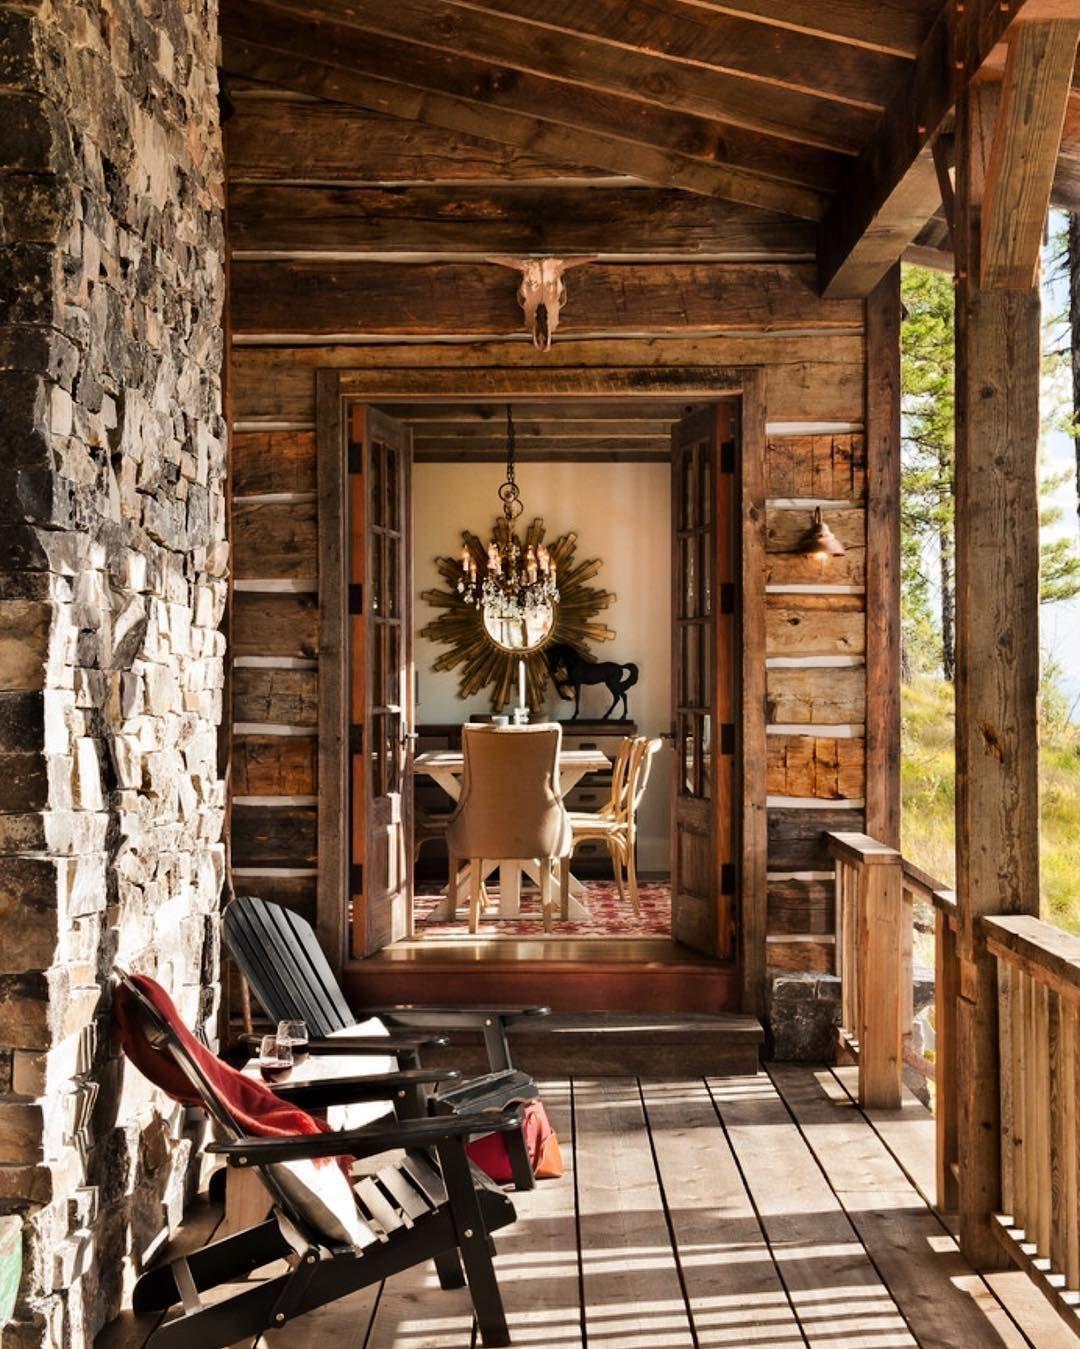 Rustic Elegance | Rustic porch, Rustic house, Rustic cabin